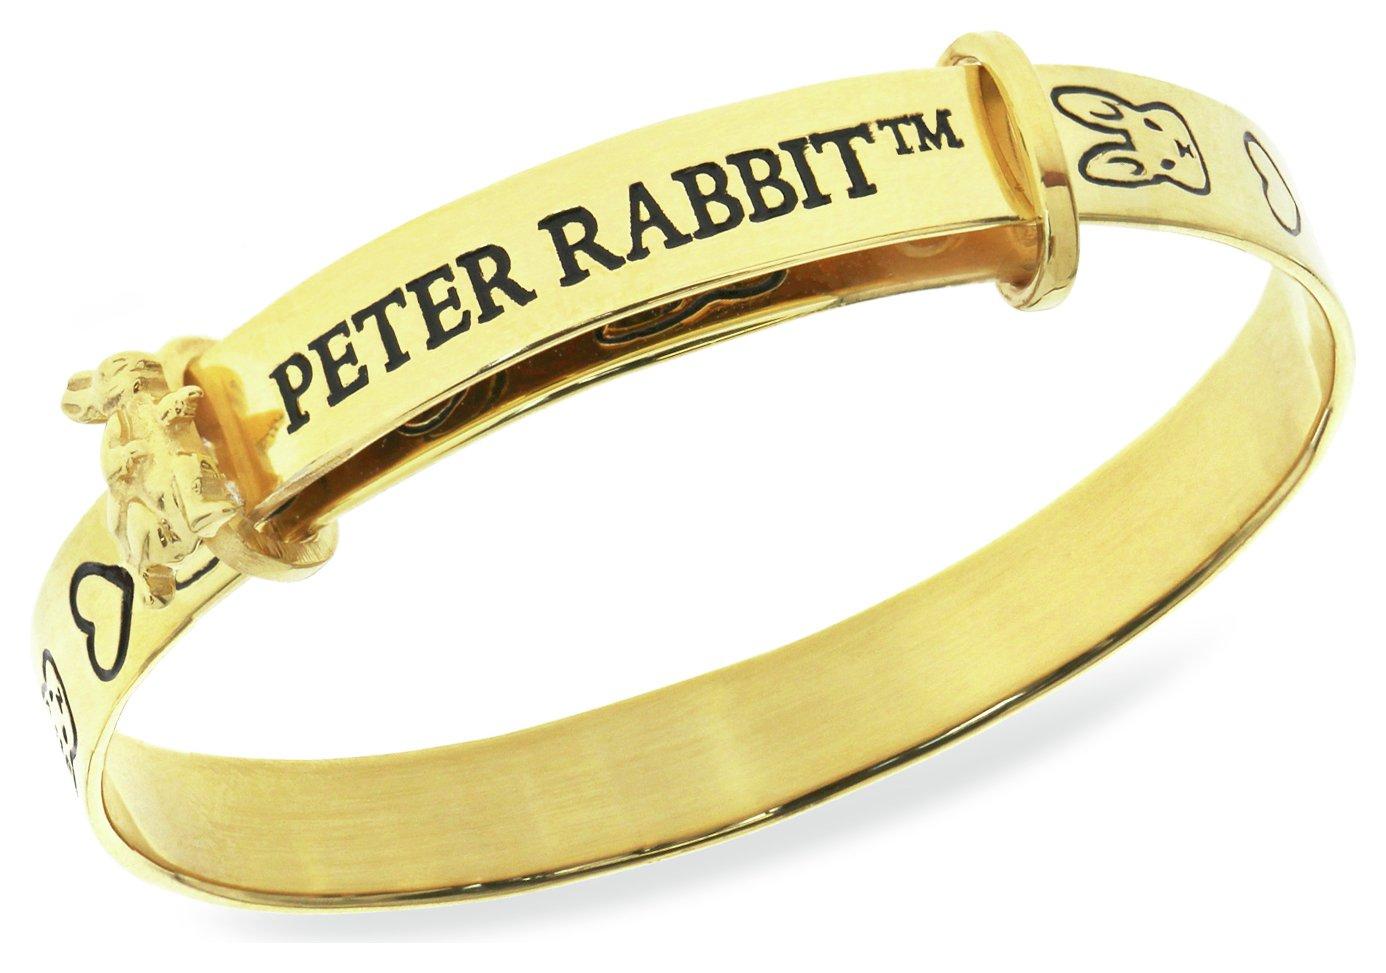 Beatrix Potter Gold Plated Peter Rabbit Expander Bangle